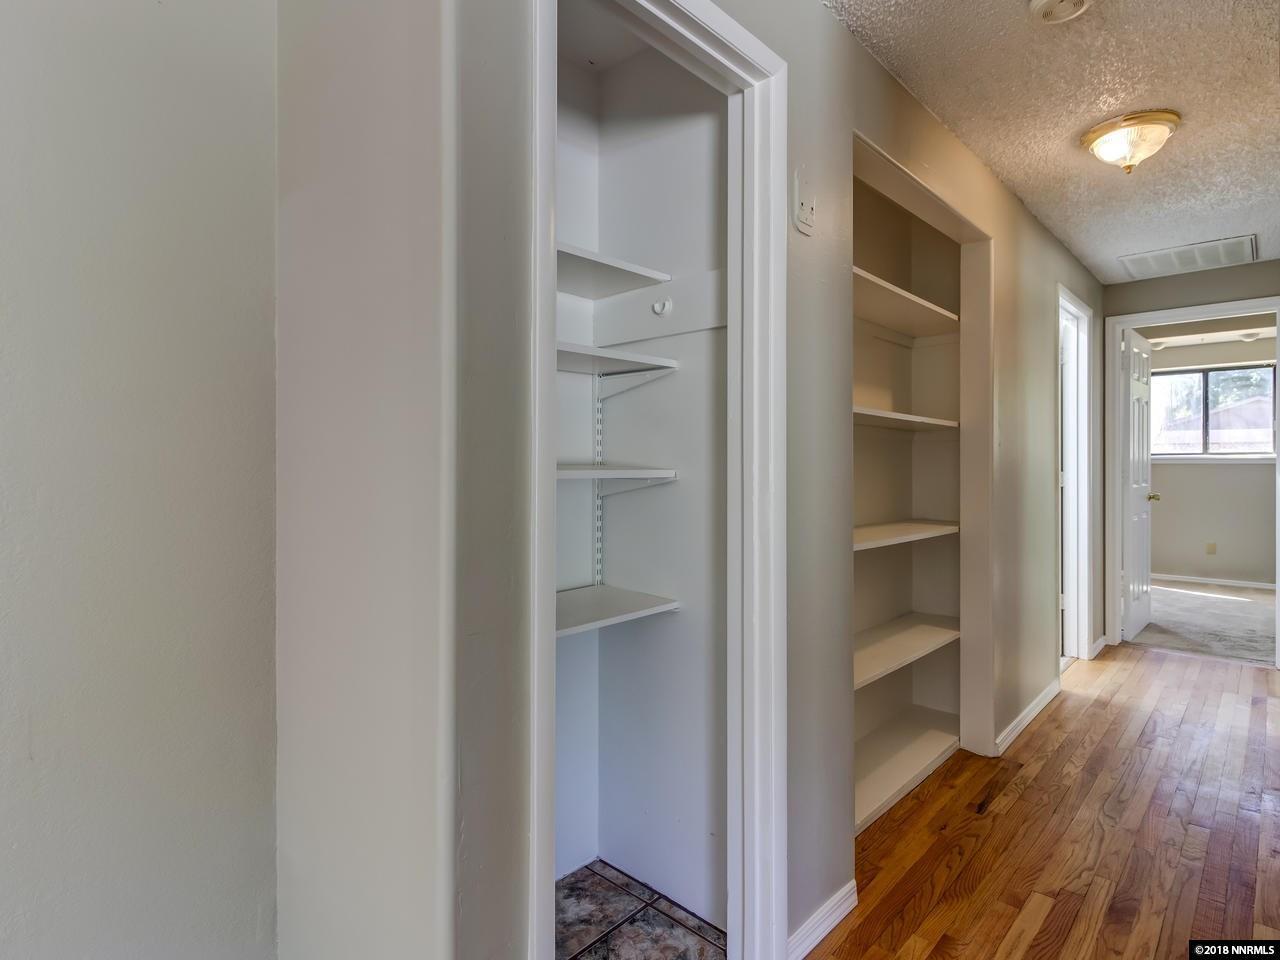 hardwood flooring stores reno nv of 11760 pepper way reno nv 89506 mls 180014336 dickson realty inside 11760 pepper way reno nv 89506